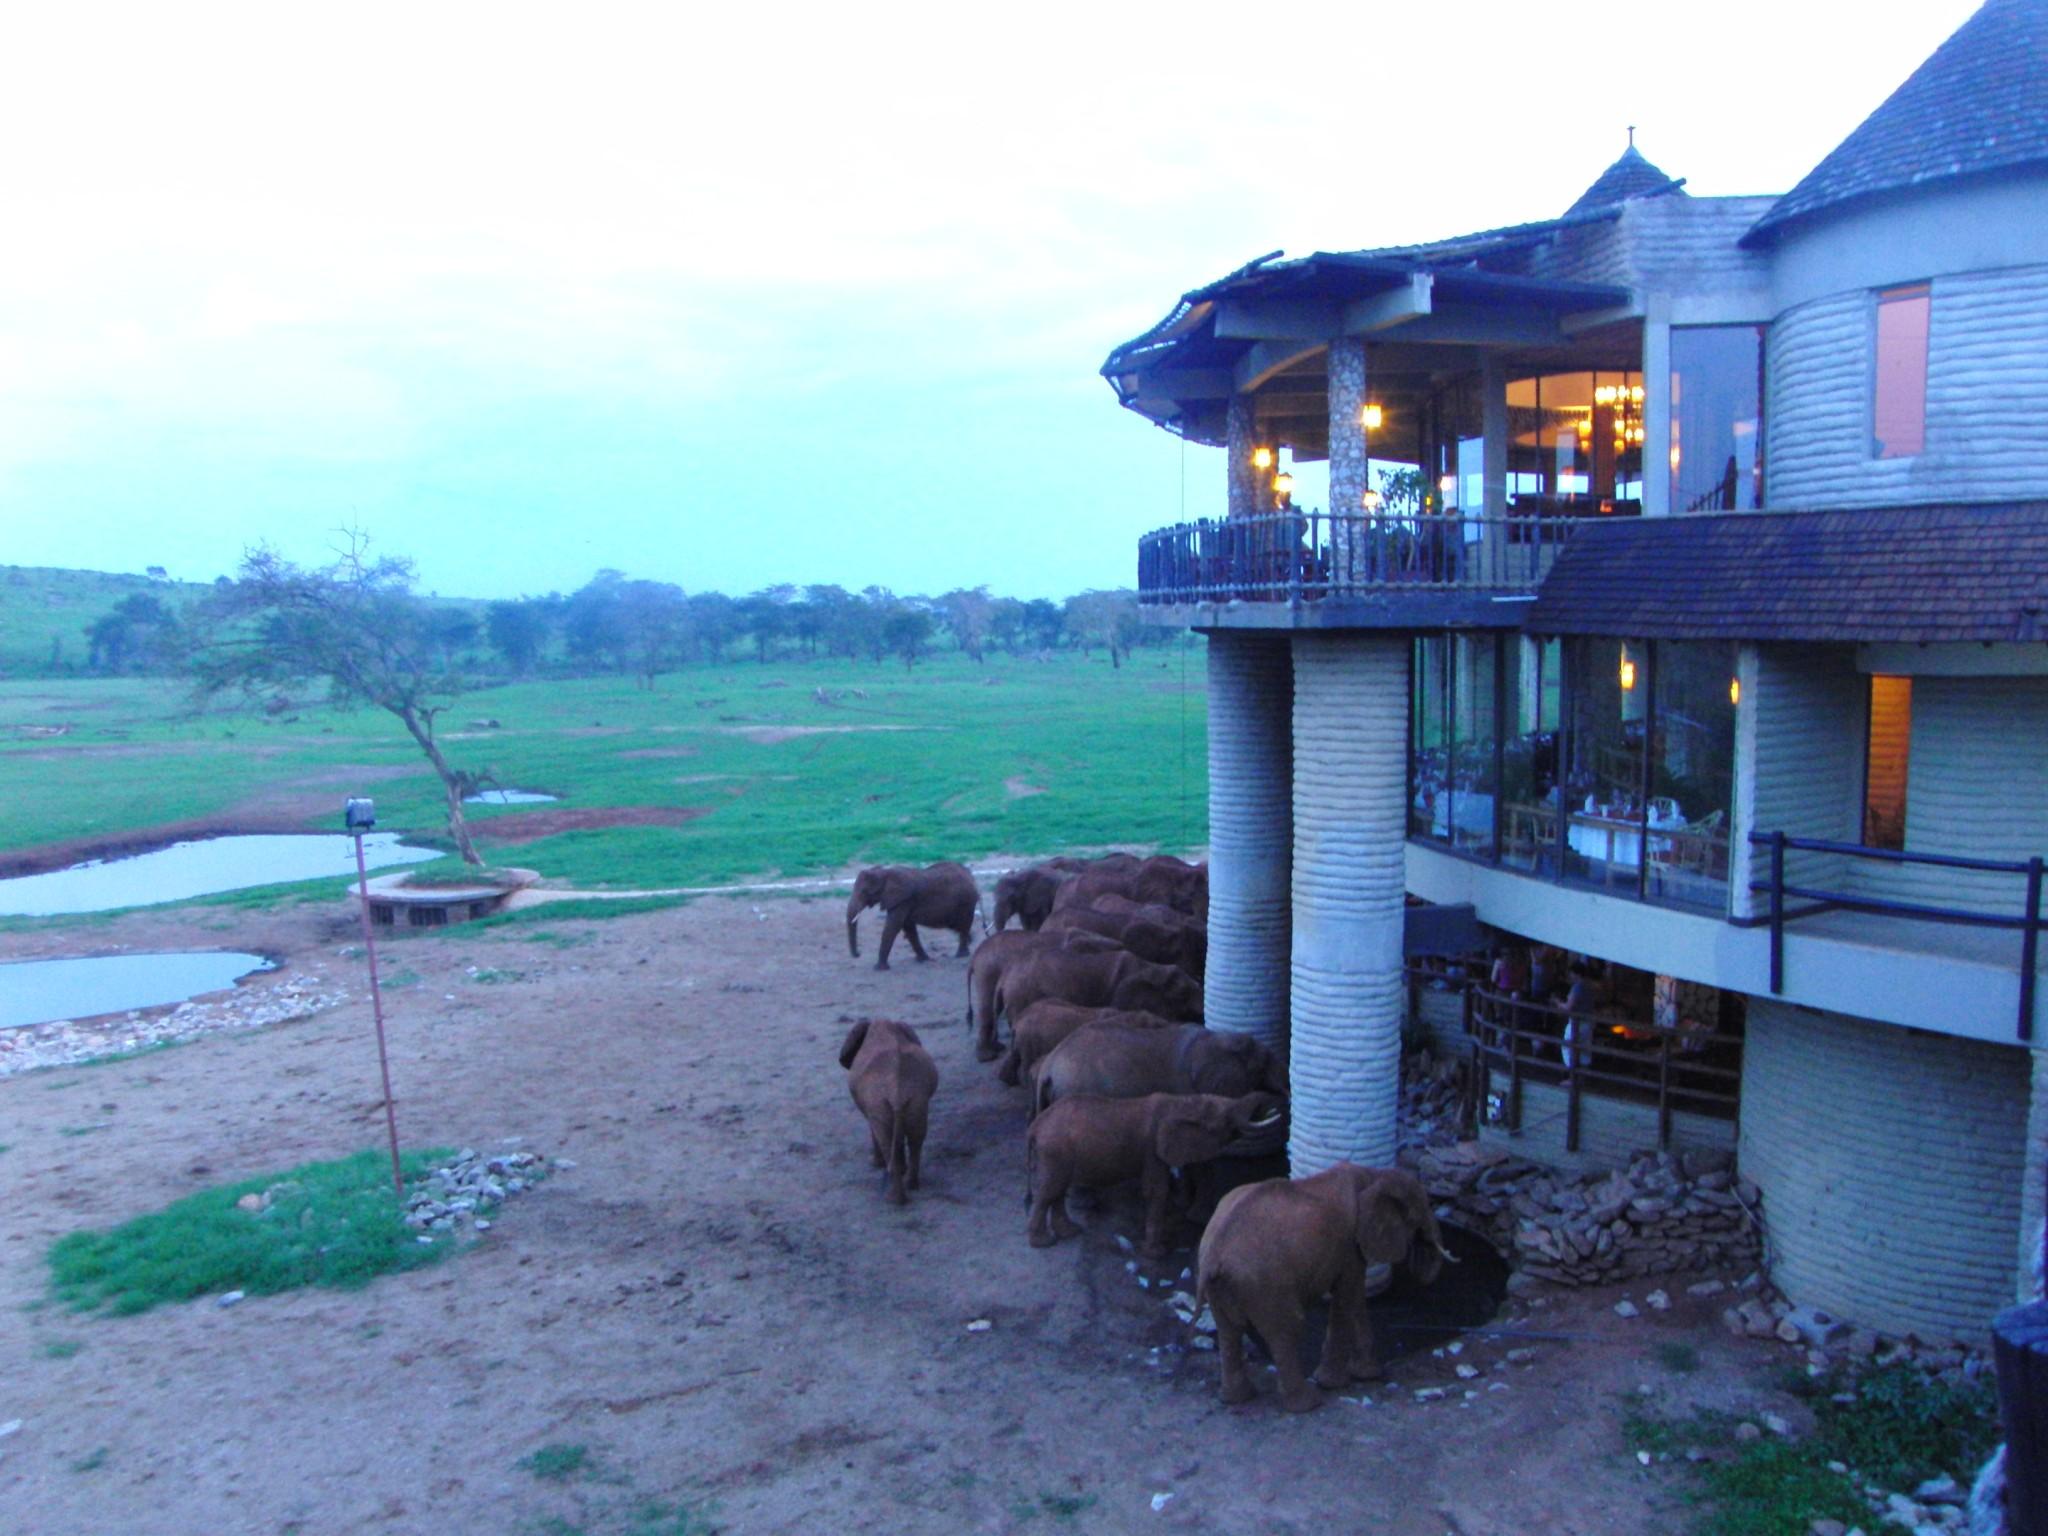 Elefanten in der Sarova-Saltlick-Game-Lodge-Taita-Hills-Schutzgebiet Keniasafari tour mit Keniaspezialist keniaurlaub.de Reisekontor Schmidt Leipzig